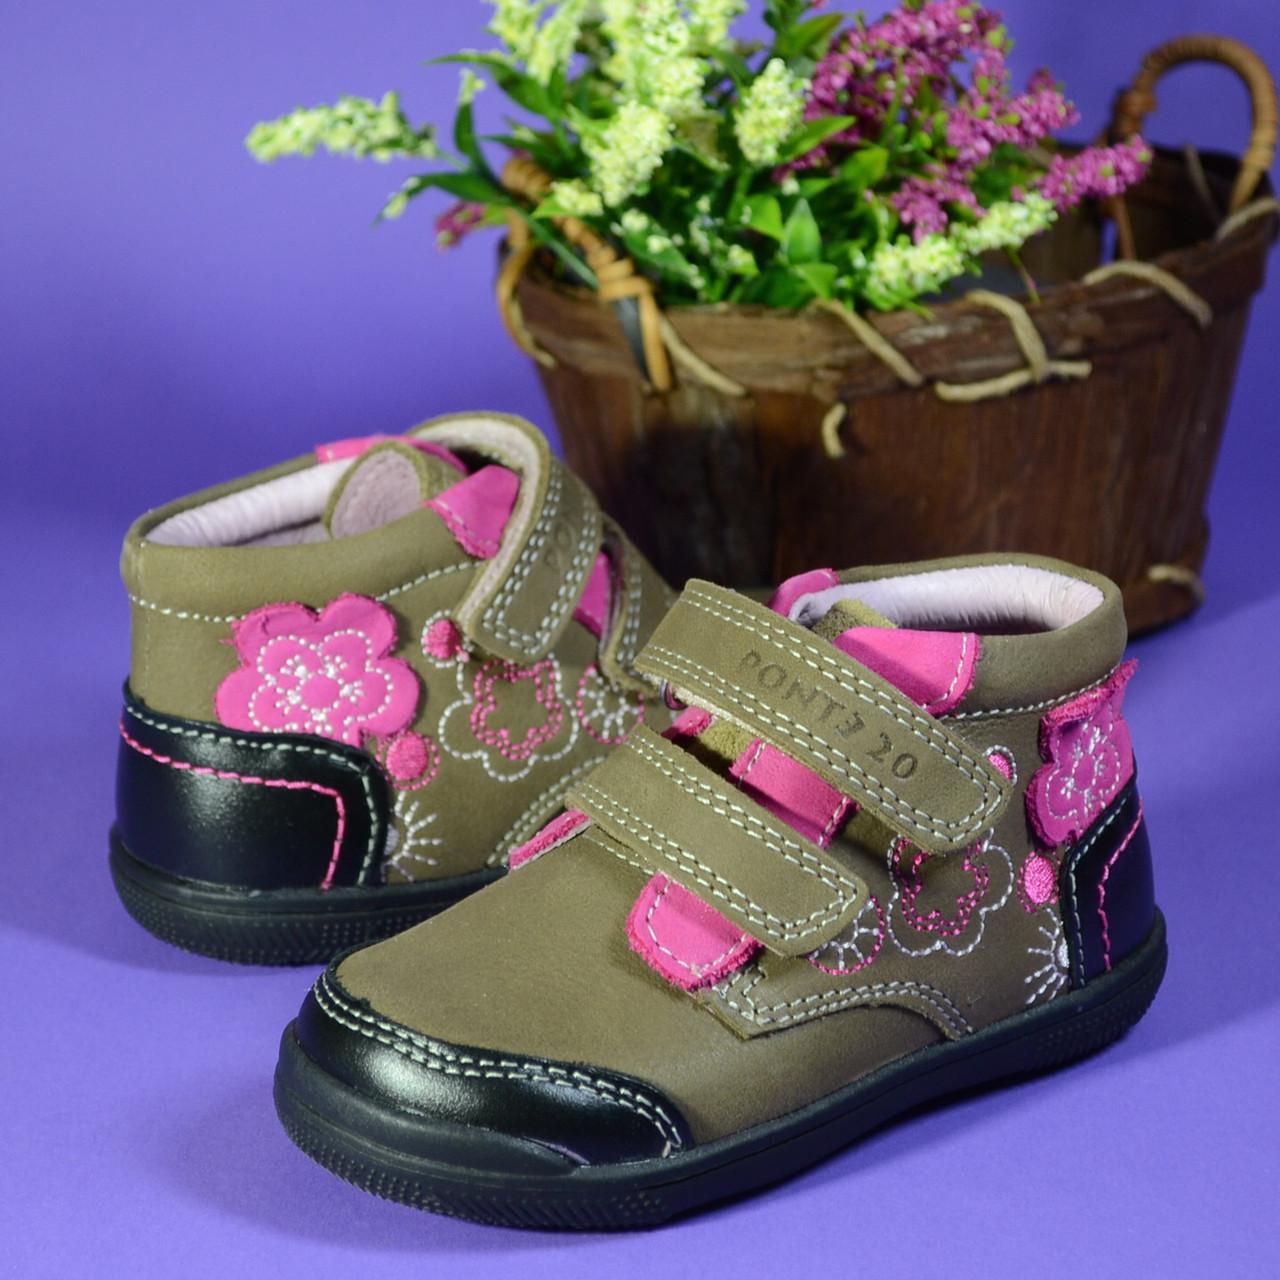 Ботинки D.D.Step DA03-1-55 chocolate (22р - 14см)